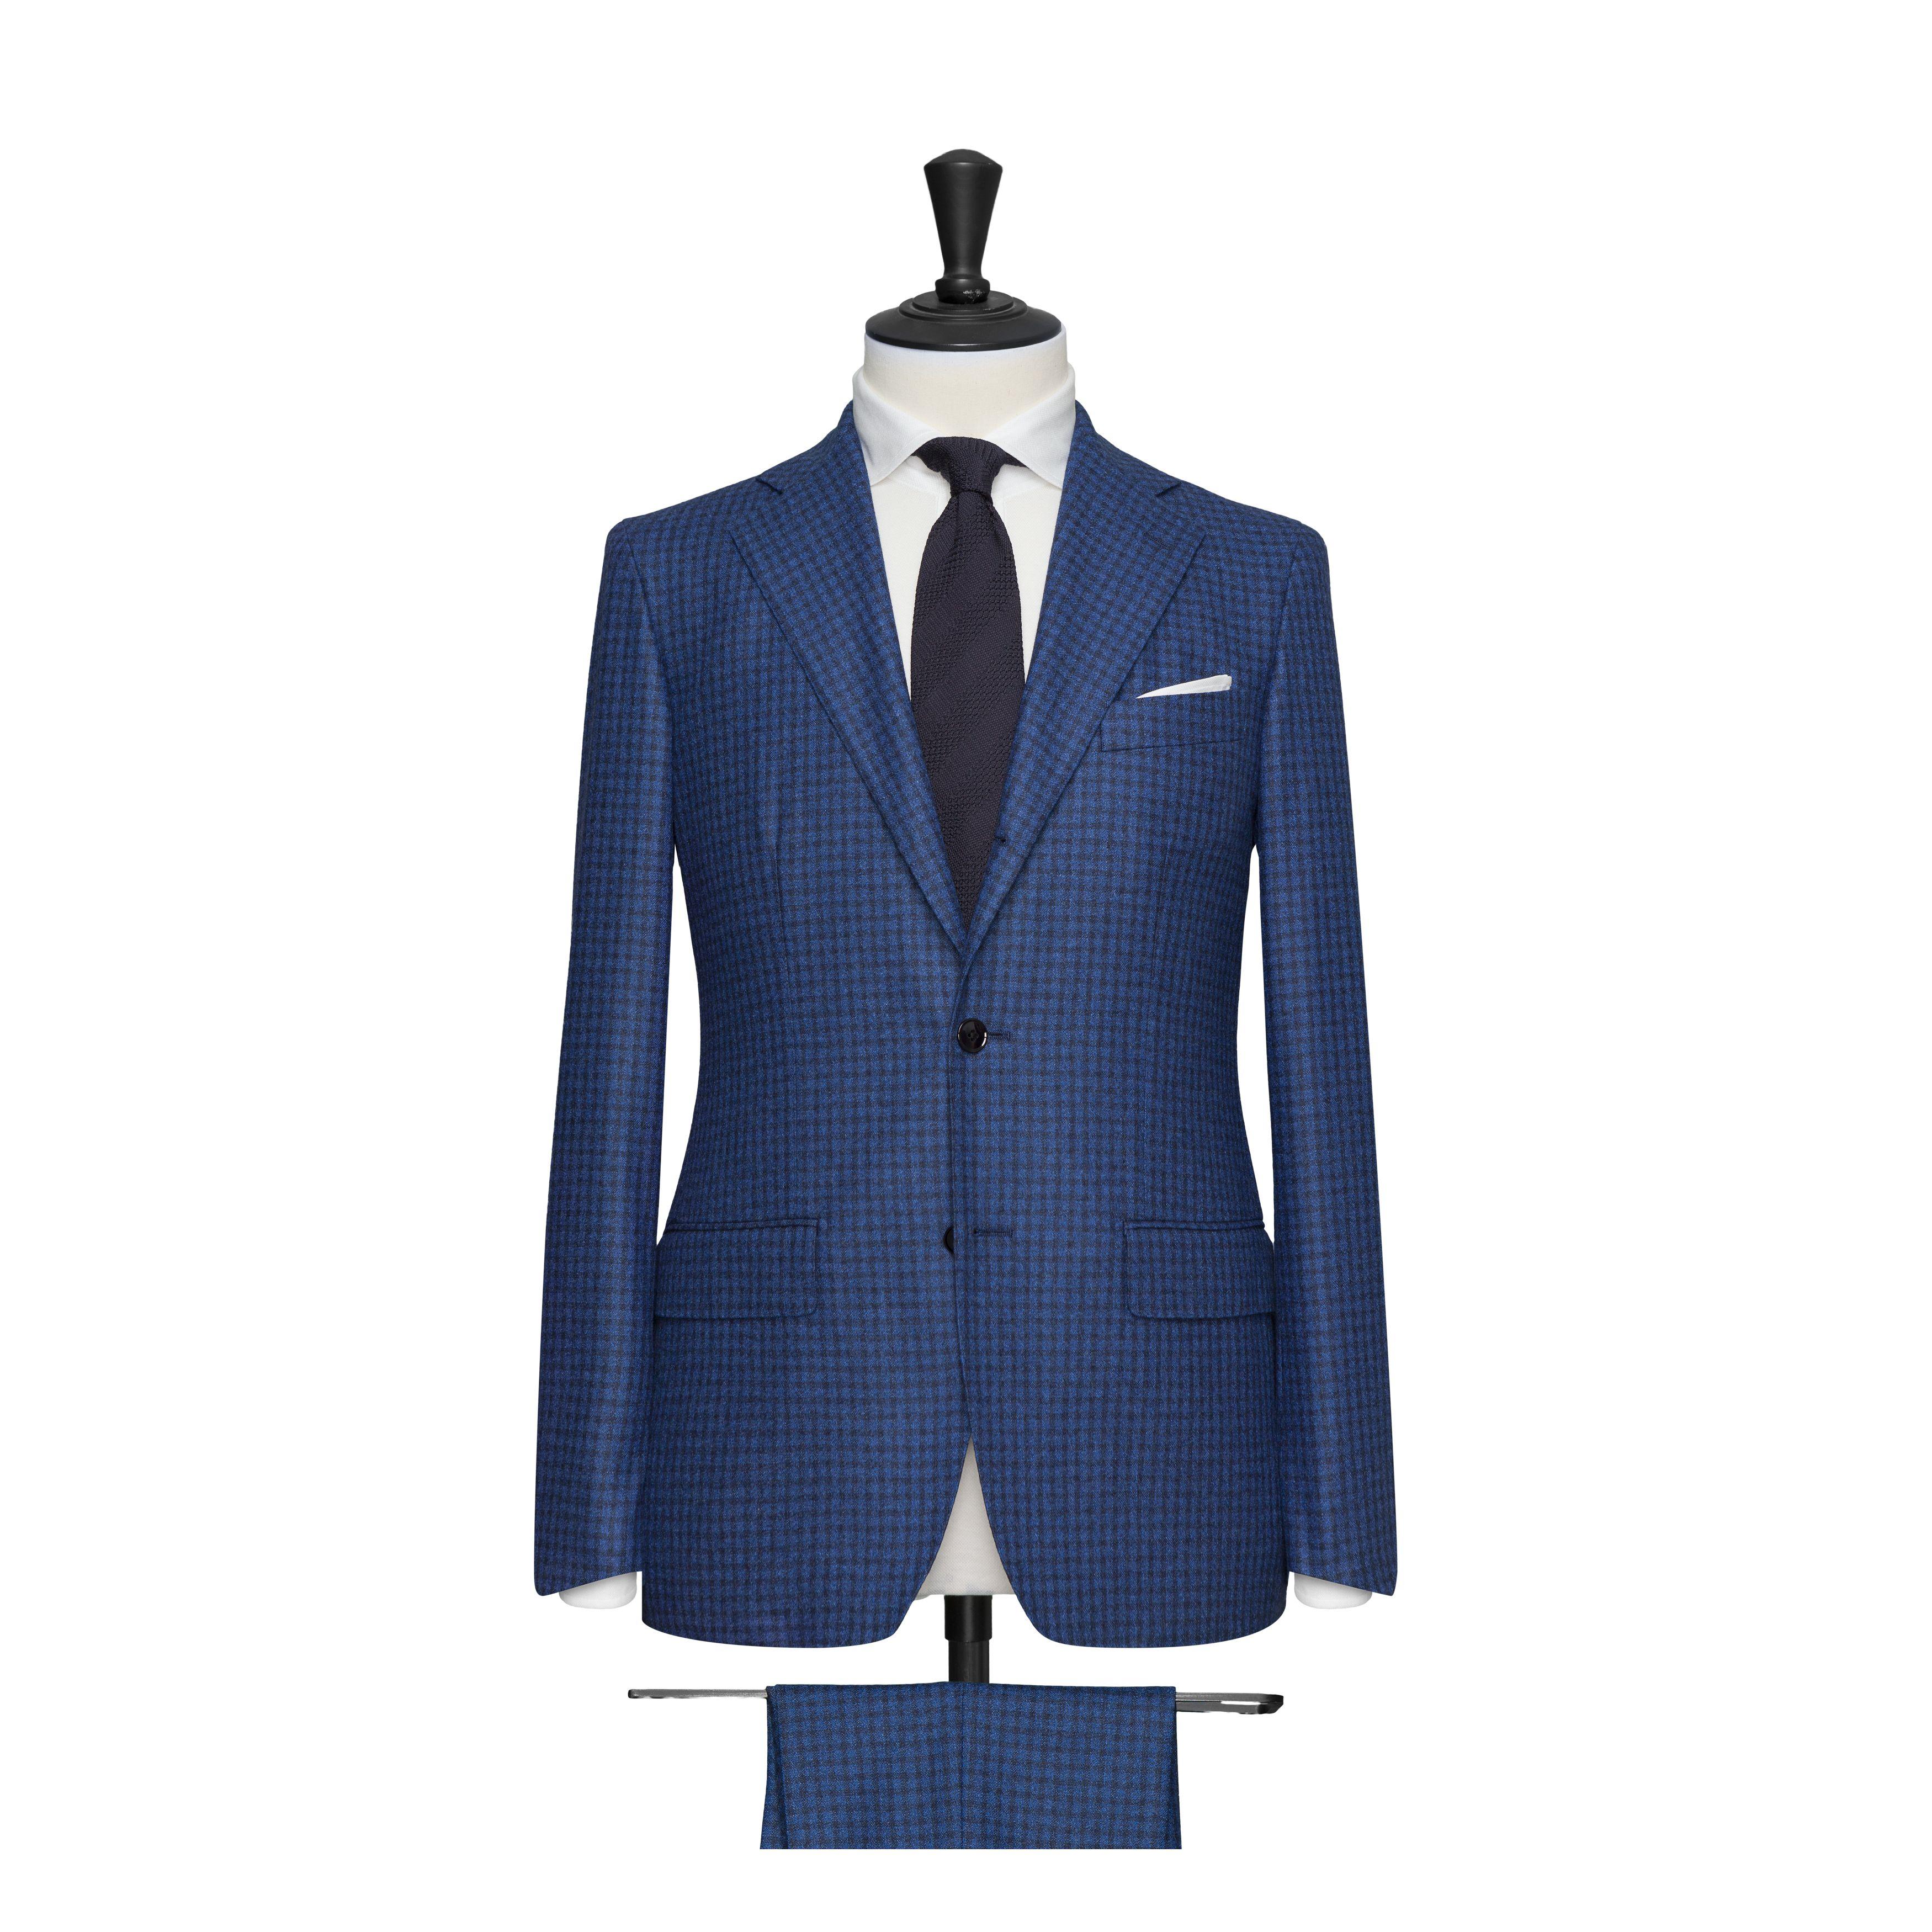 Costume petits carreaux, 2 boutons, poches droites - Bleu chardon